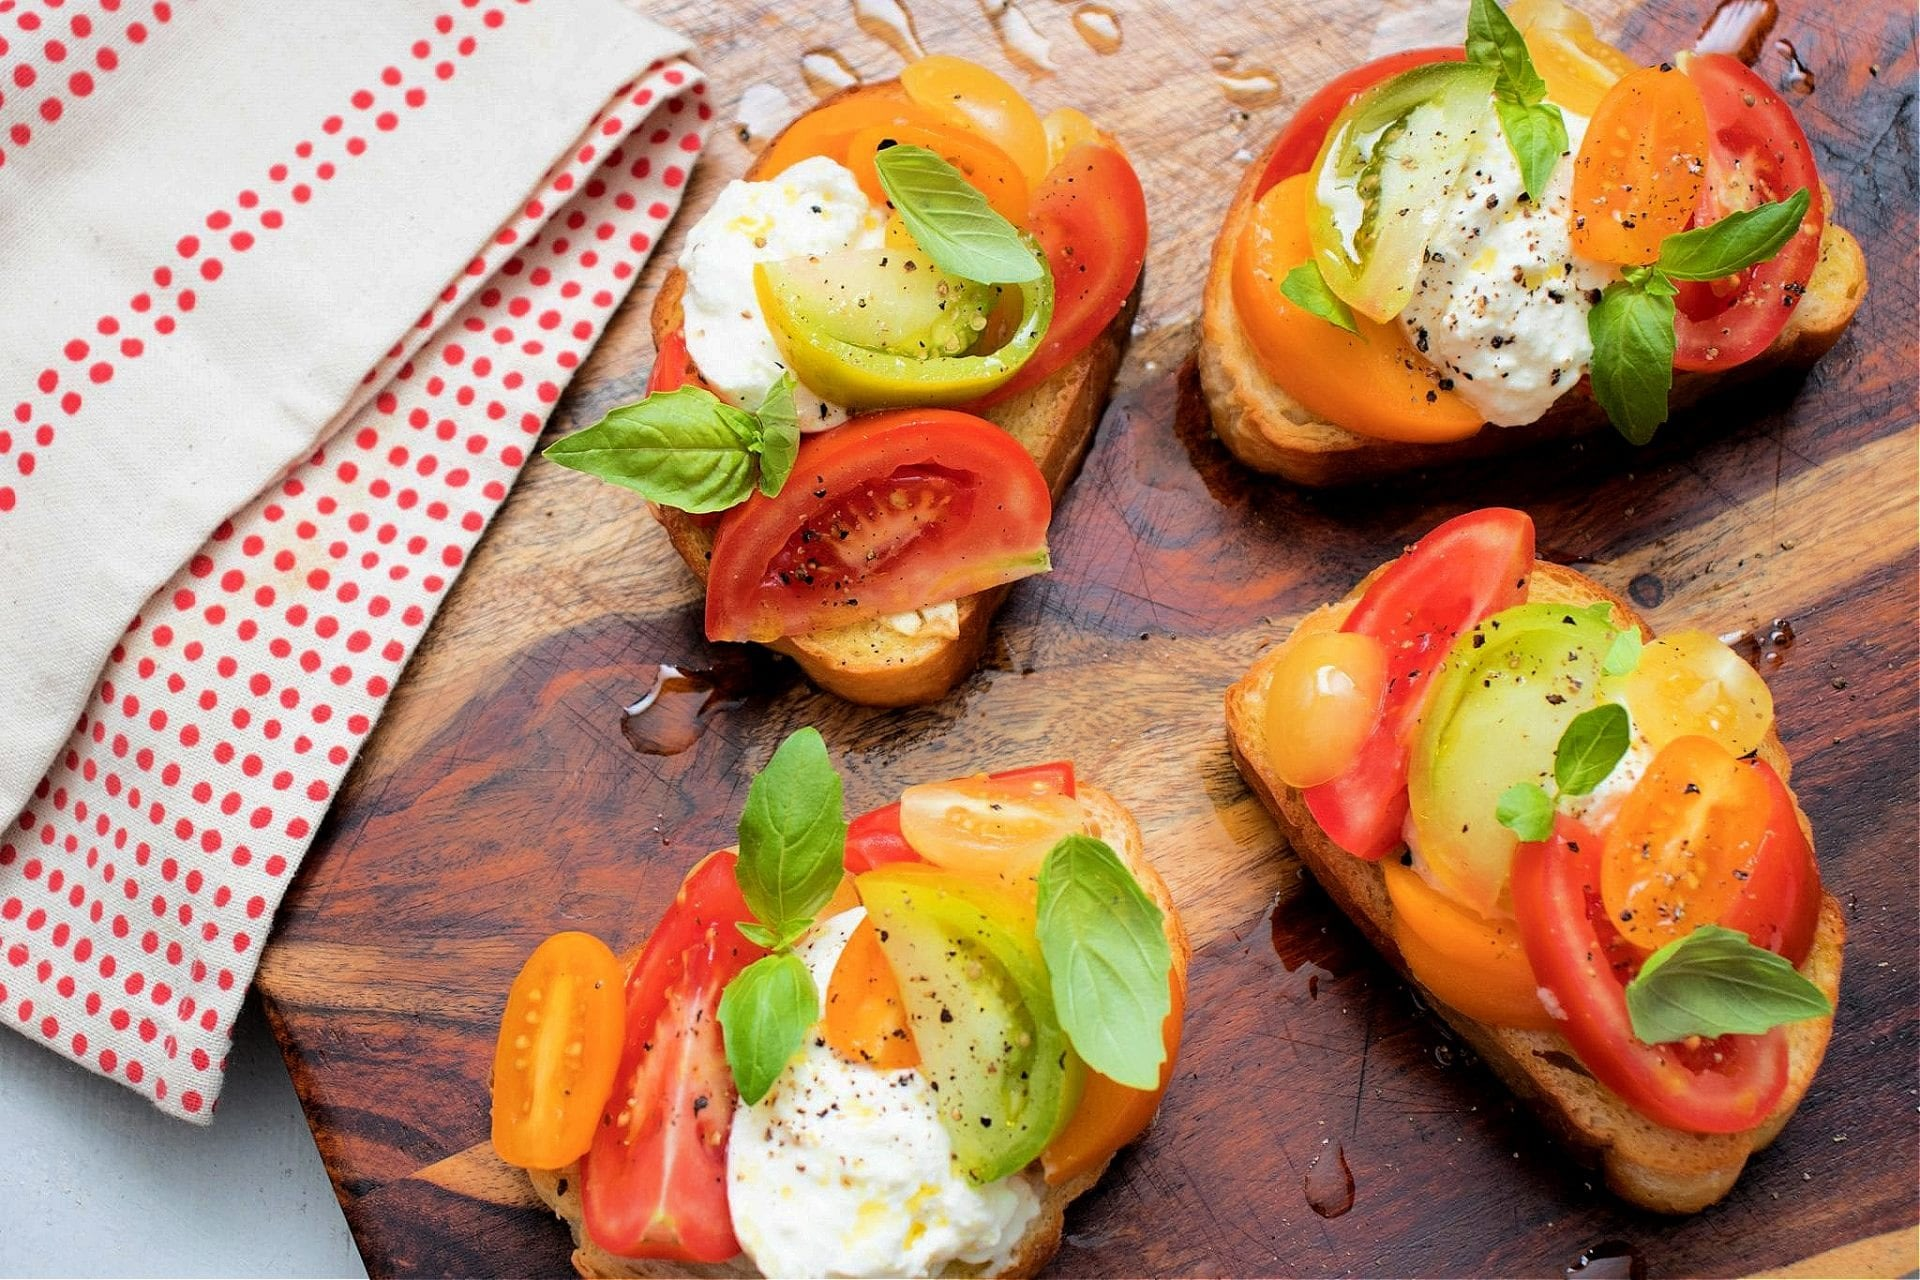 Olive Oil Pomodoro Toasts with Burrata